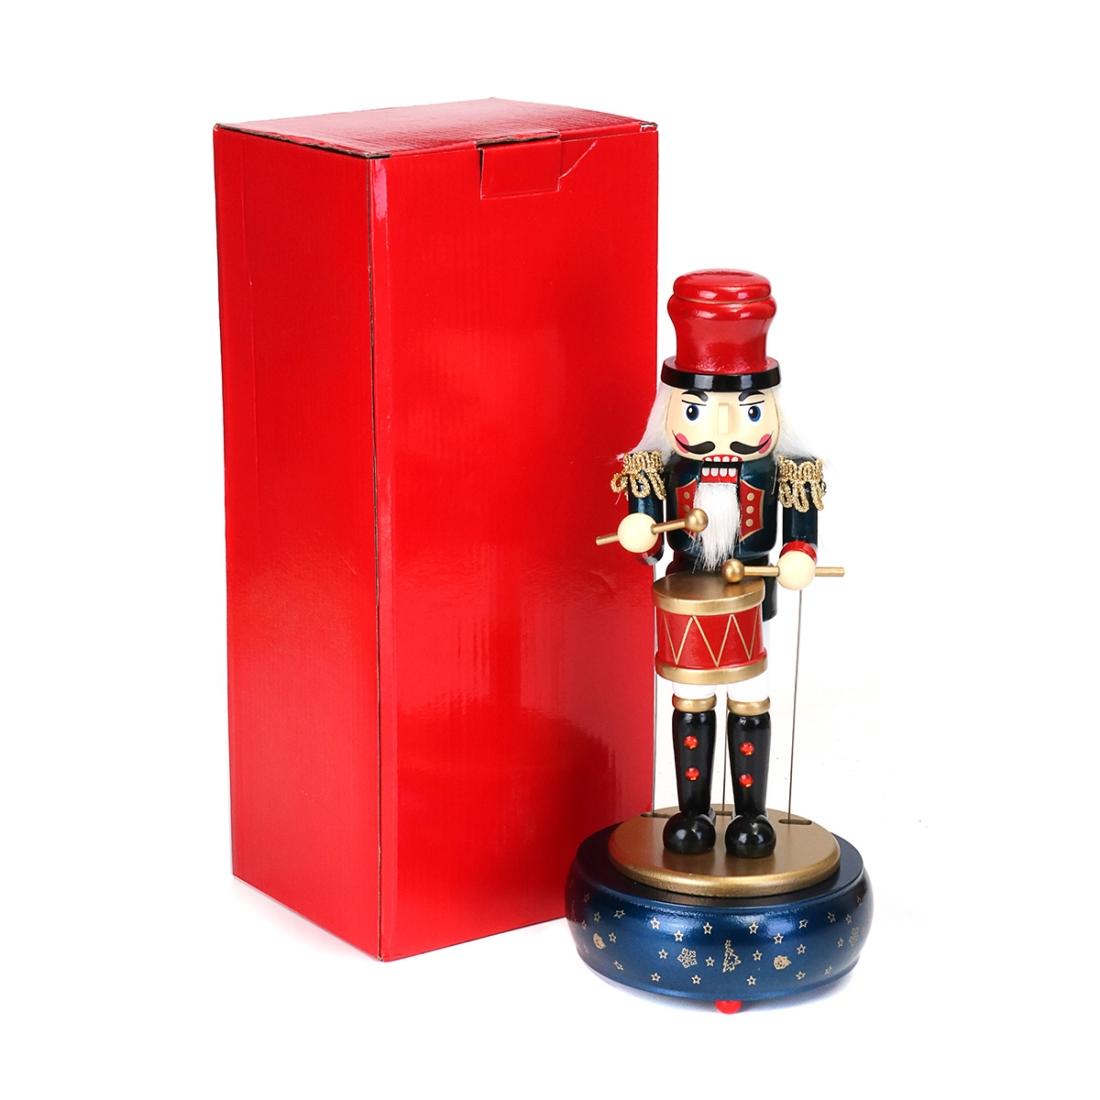 Retro Wooden Nutcracker Drummer Music Box for Gift Vintage Home Decoration (Red)